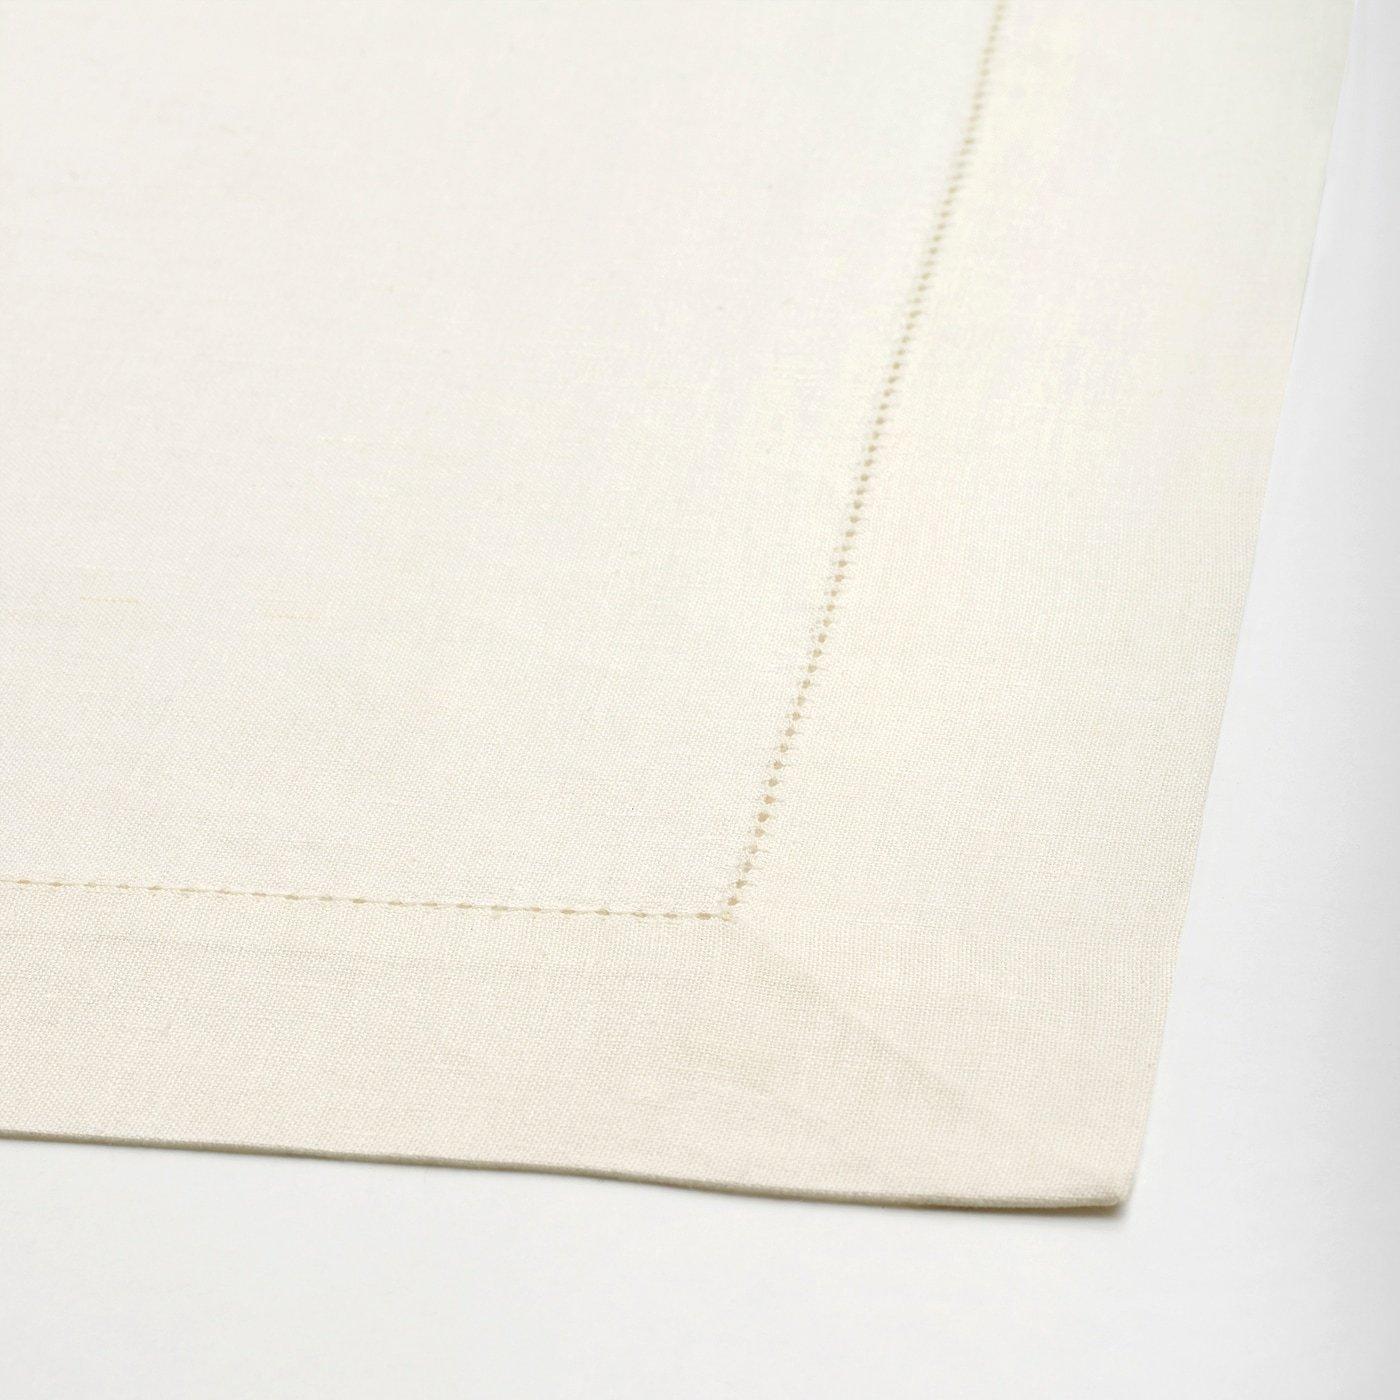 Lace Linen Napkins Ivory